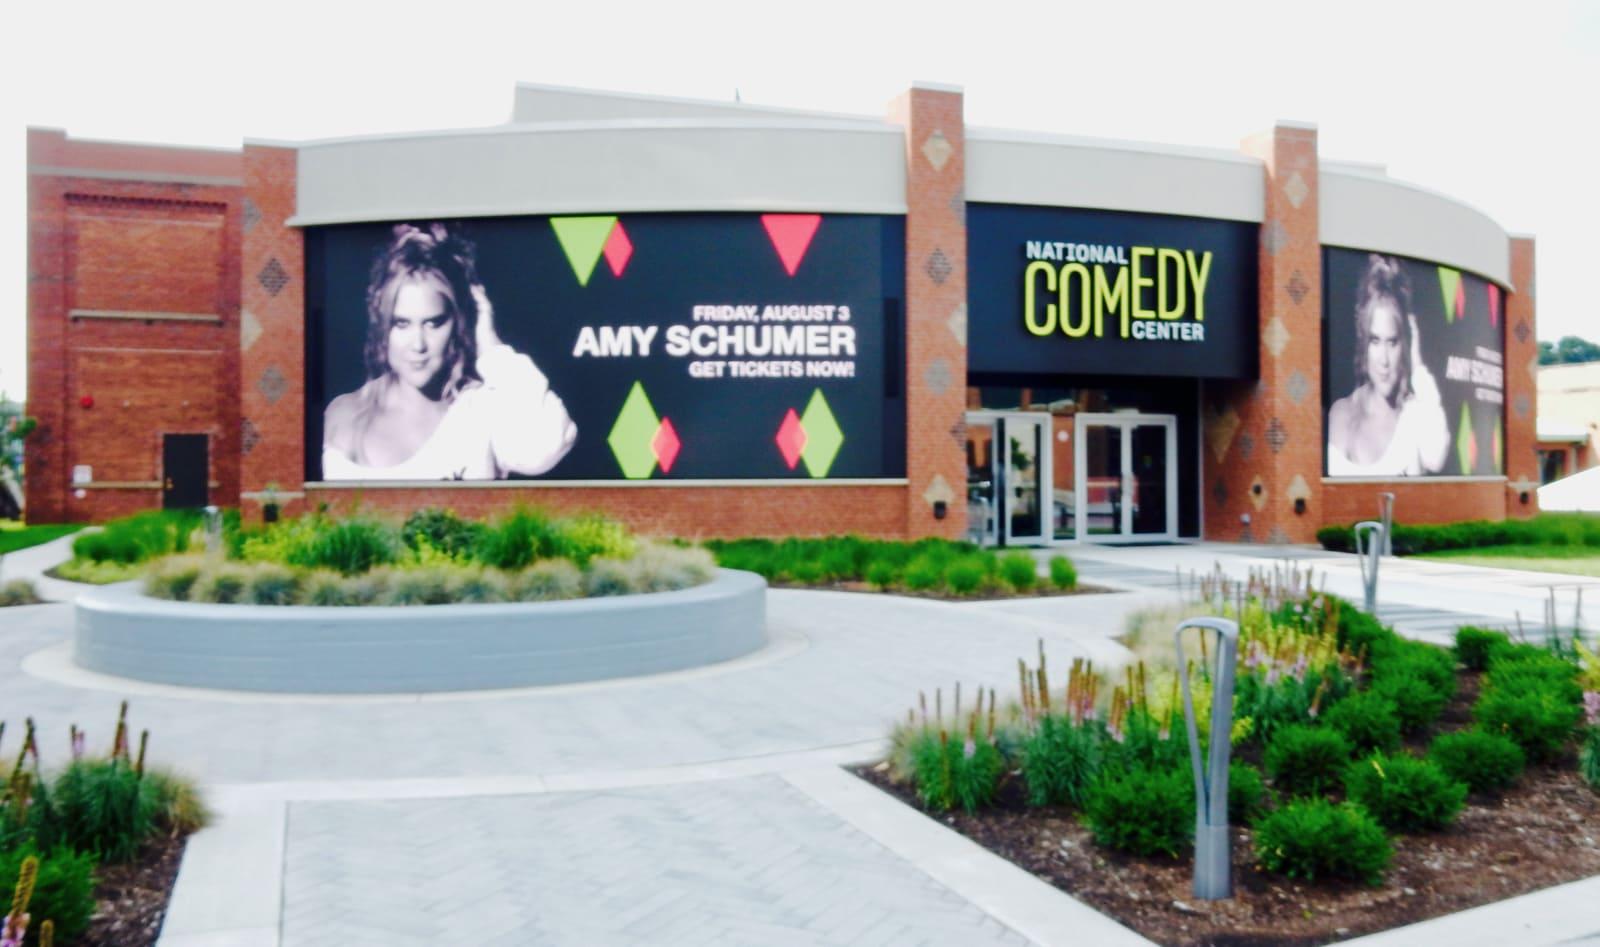 National Comedy Center, Jamestown NY